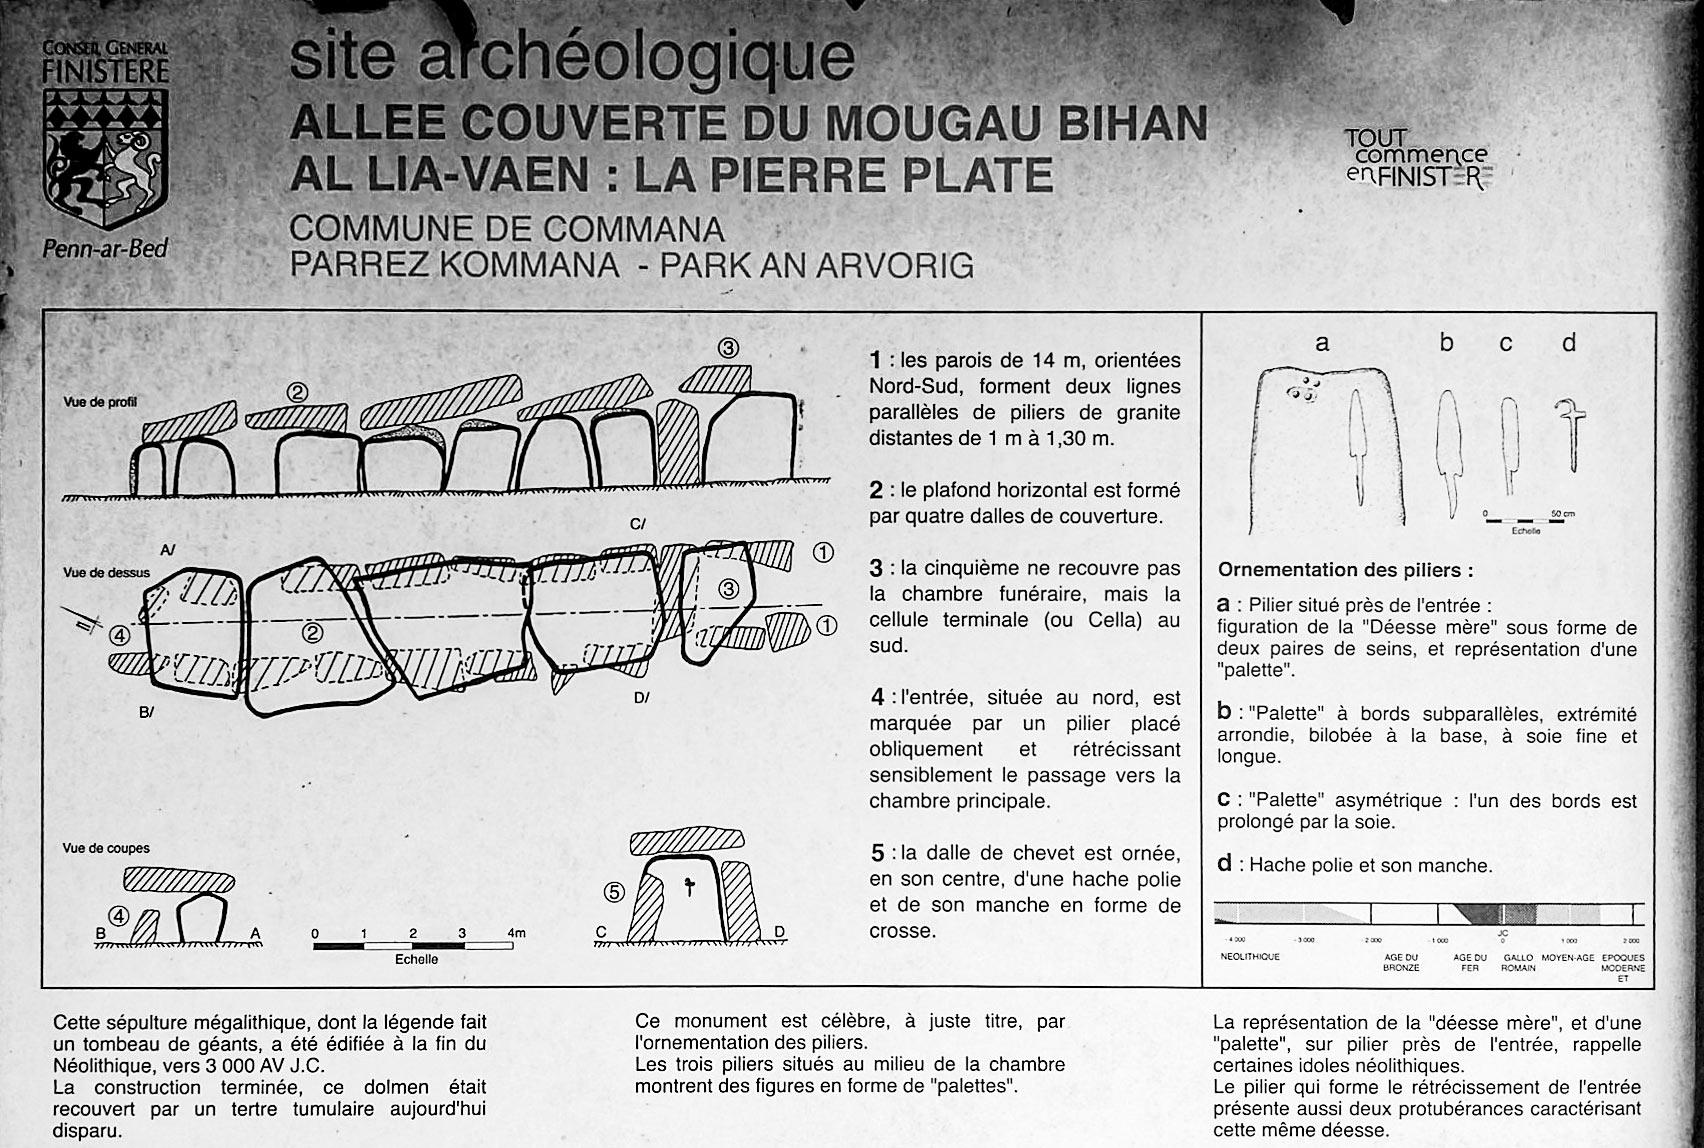 Allée Couverte du Mougau-Bihan - Photo Hélène Guillou 2020